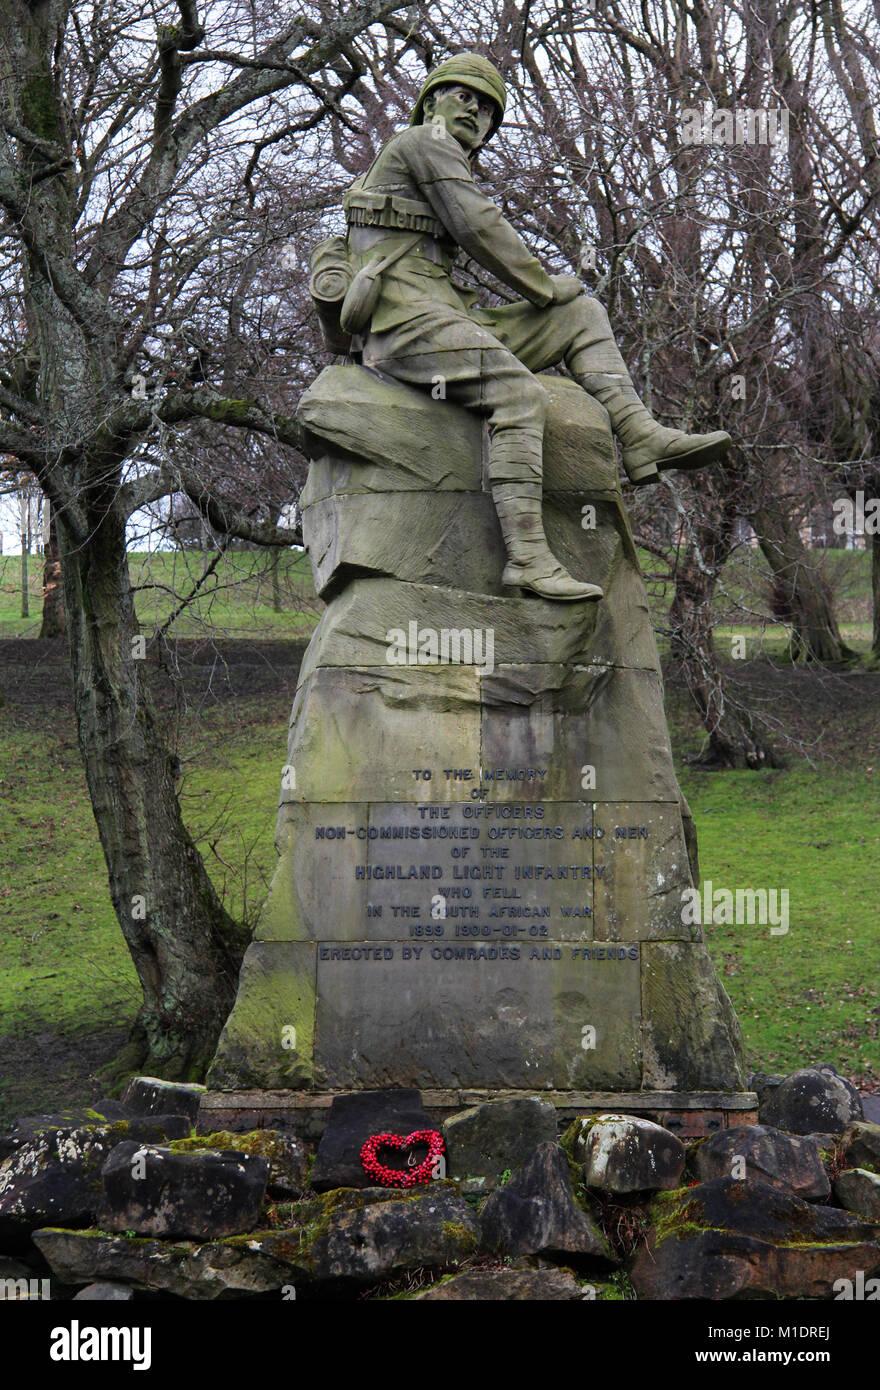 Highland Light Infantry Memorial, South African War, Kelvingorve Park, Glasgow, Scotland, UK - Stock Image